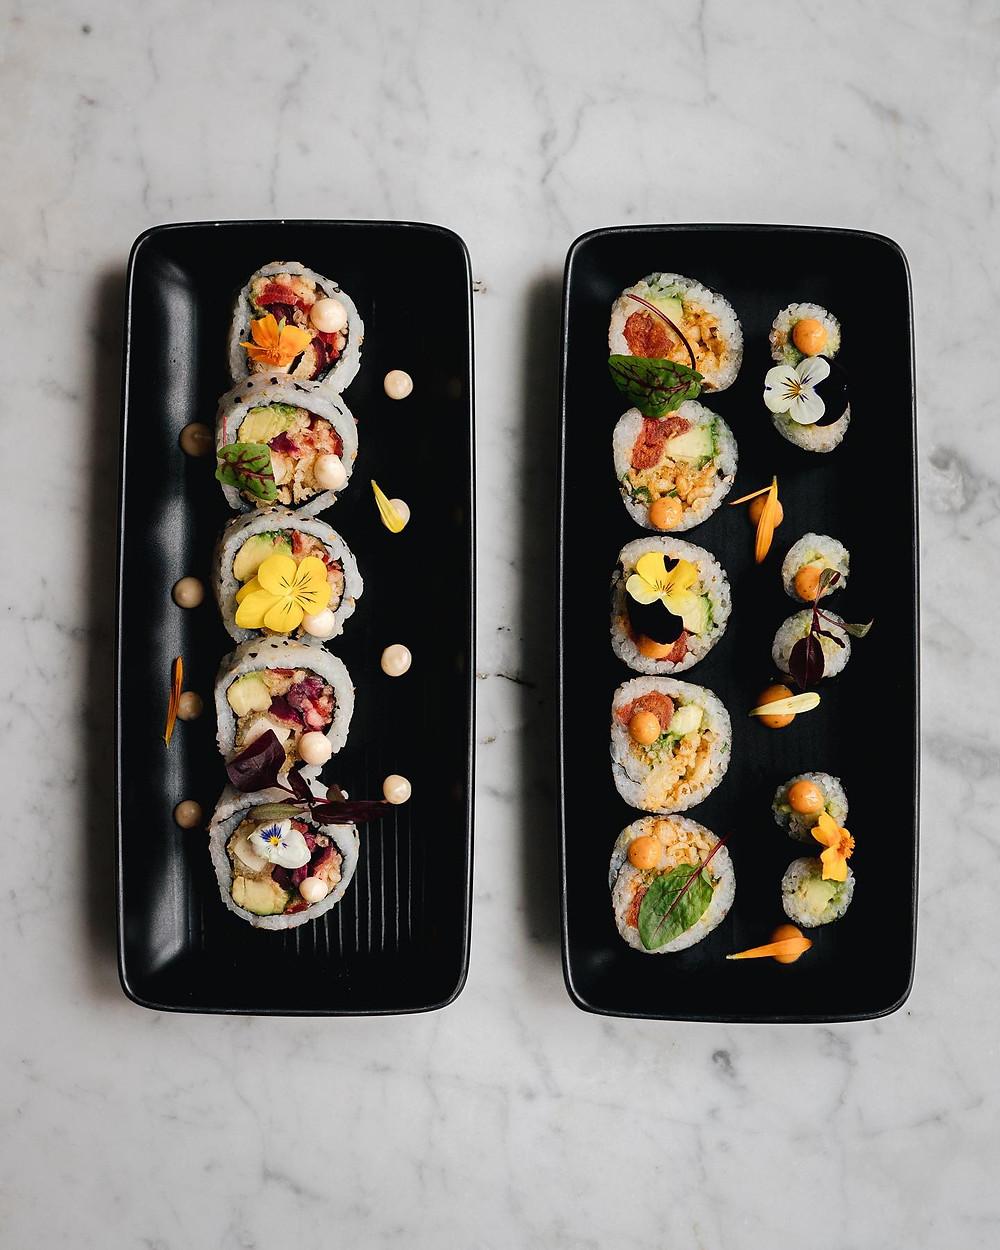 Bloom-vegan-sushi-counter-lov-laval-vegetarian-restaurant-west-island.jpg